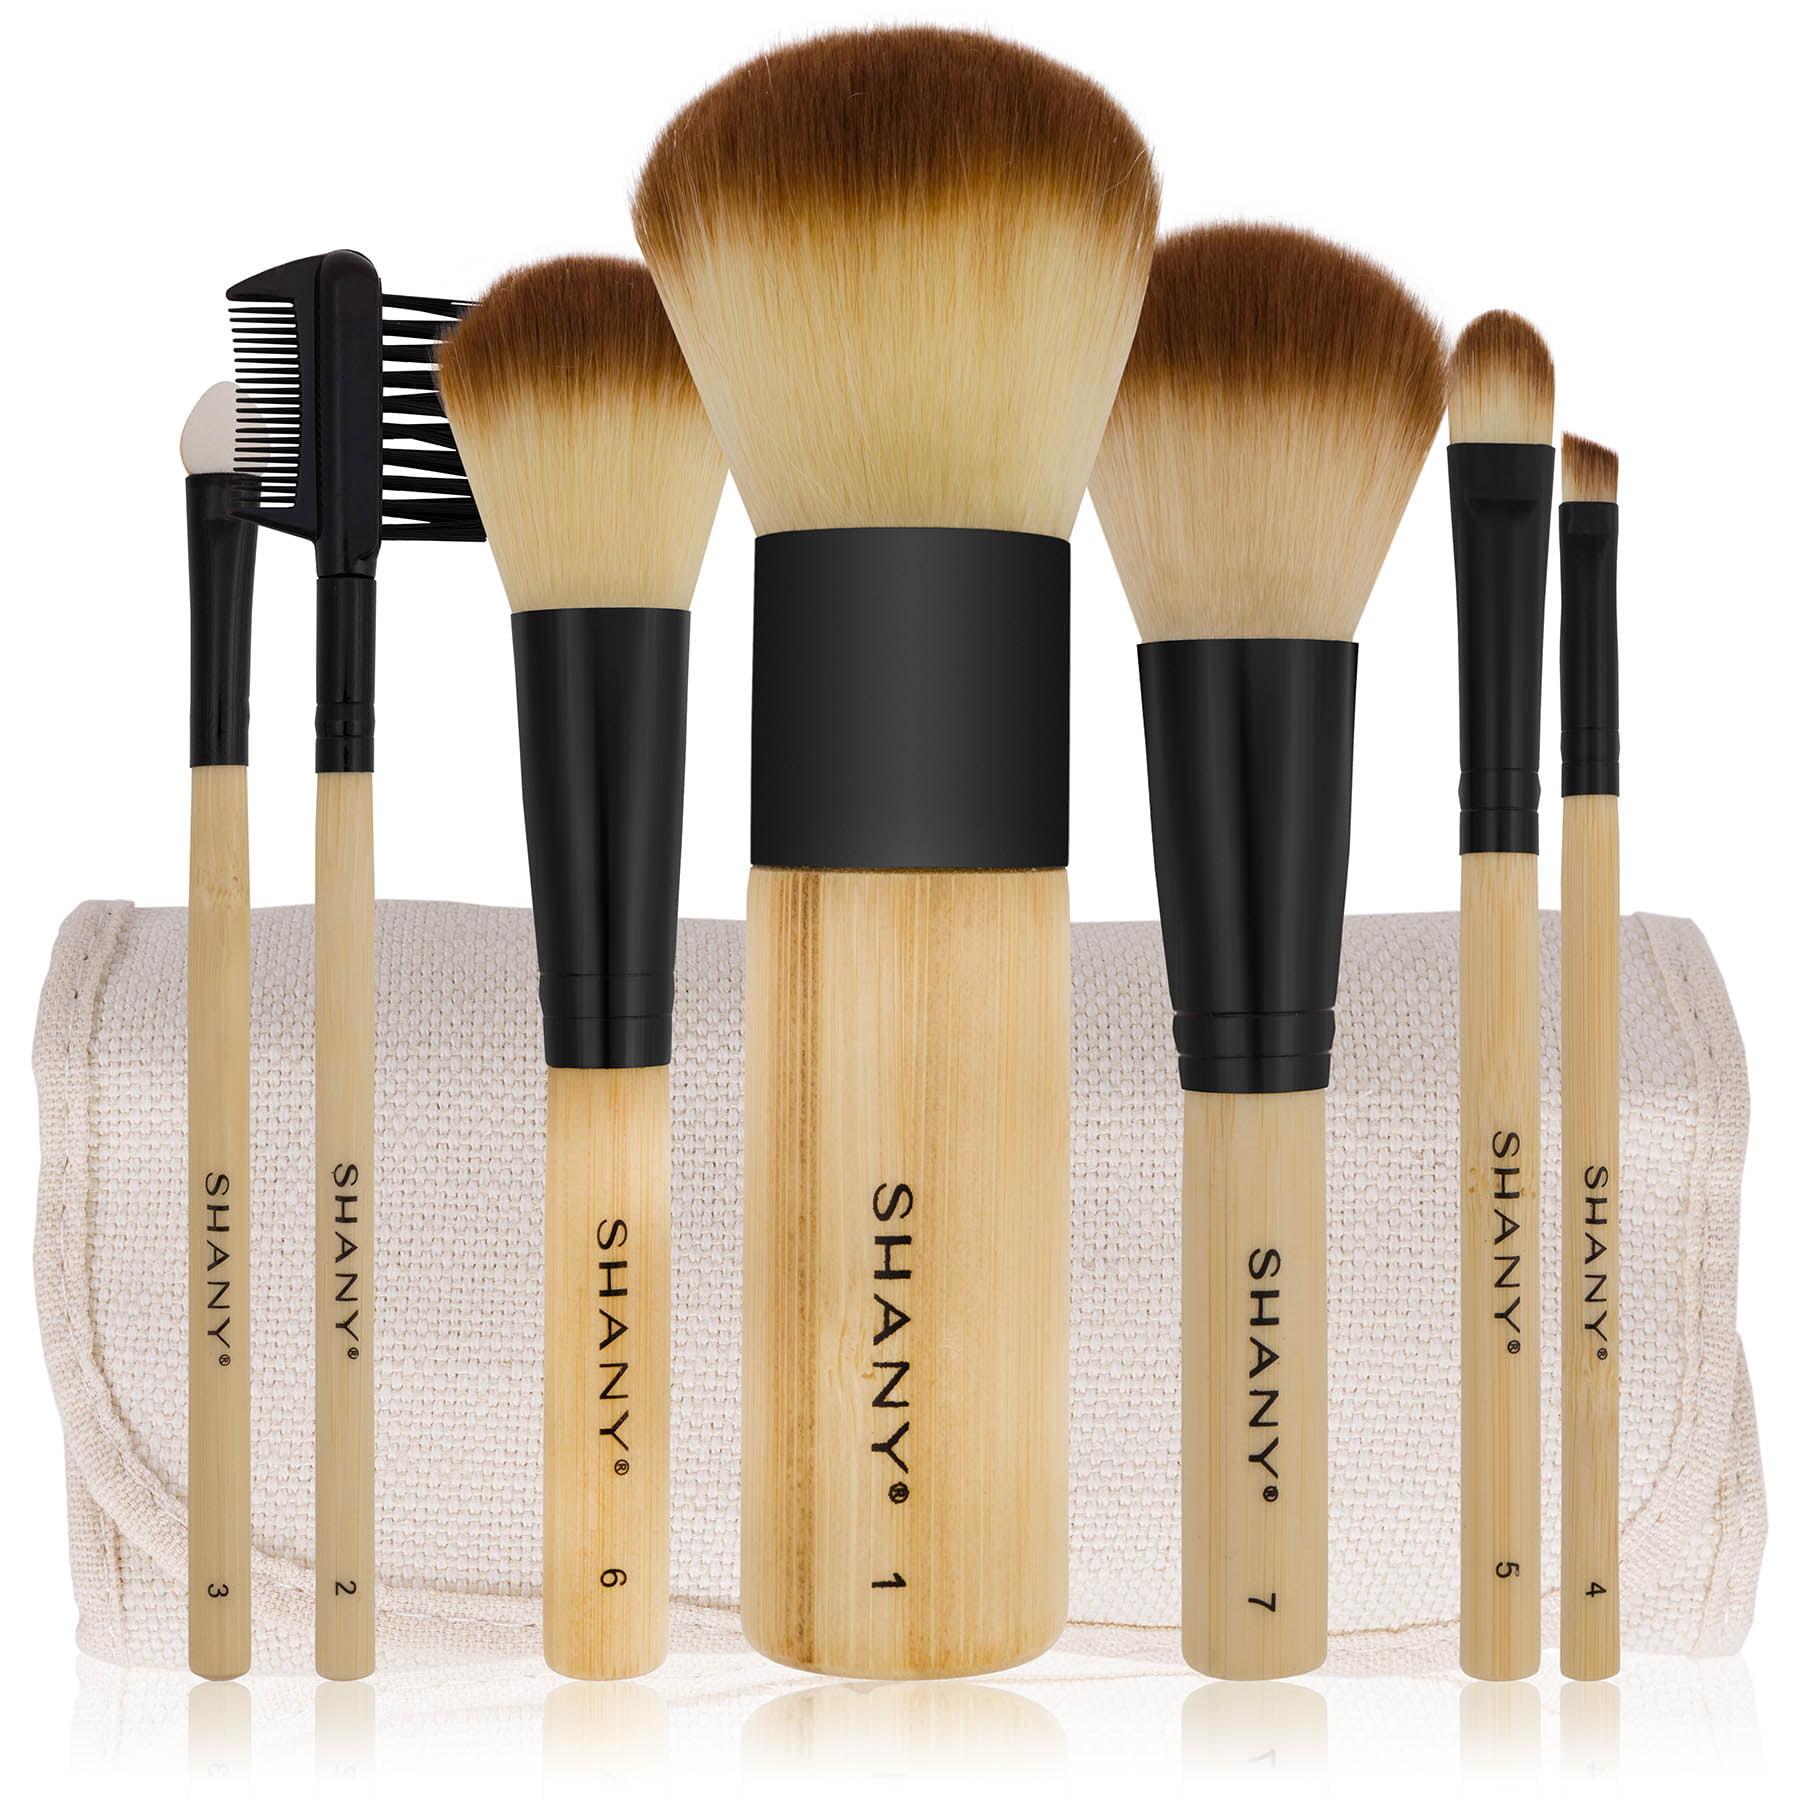 SHANY Bamboo Makeup Brush Set (7 Count)